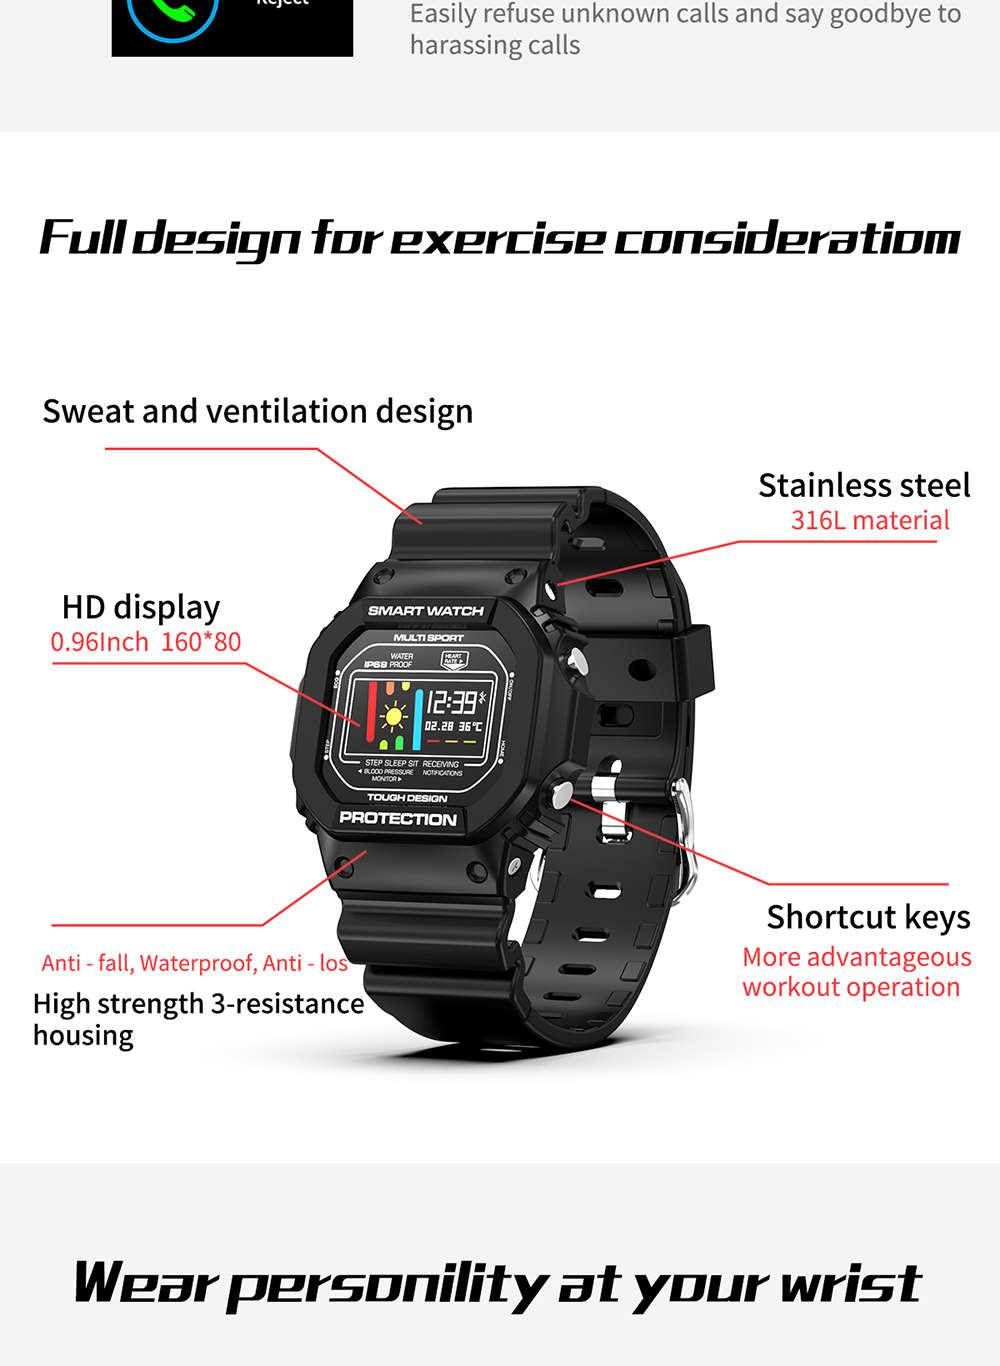 X12 Digital smart watch (17)